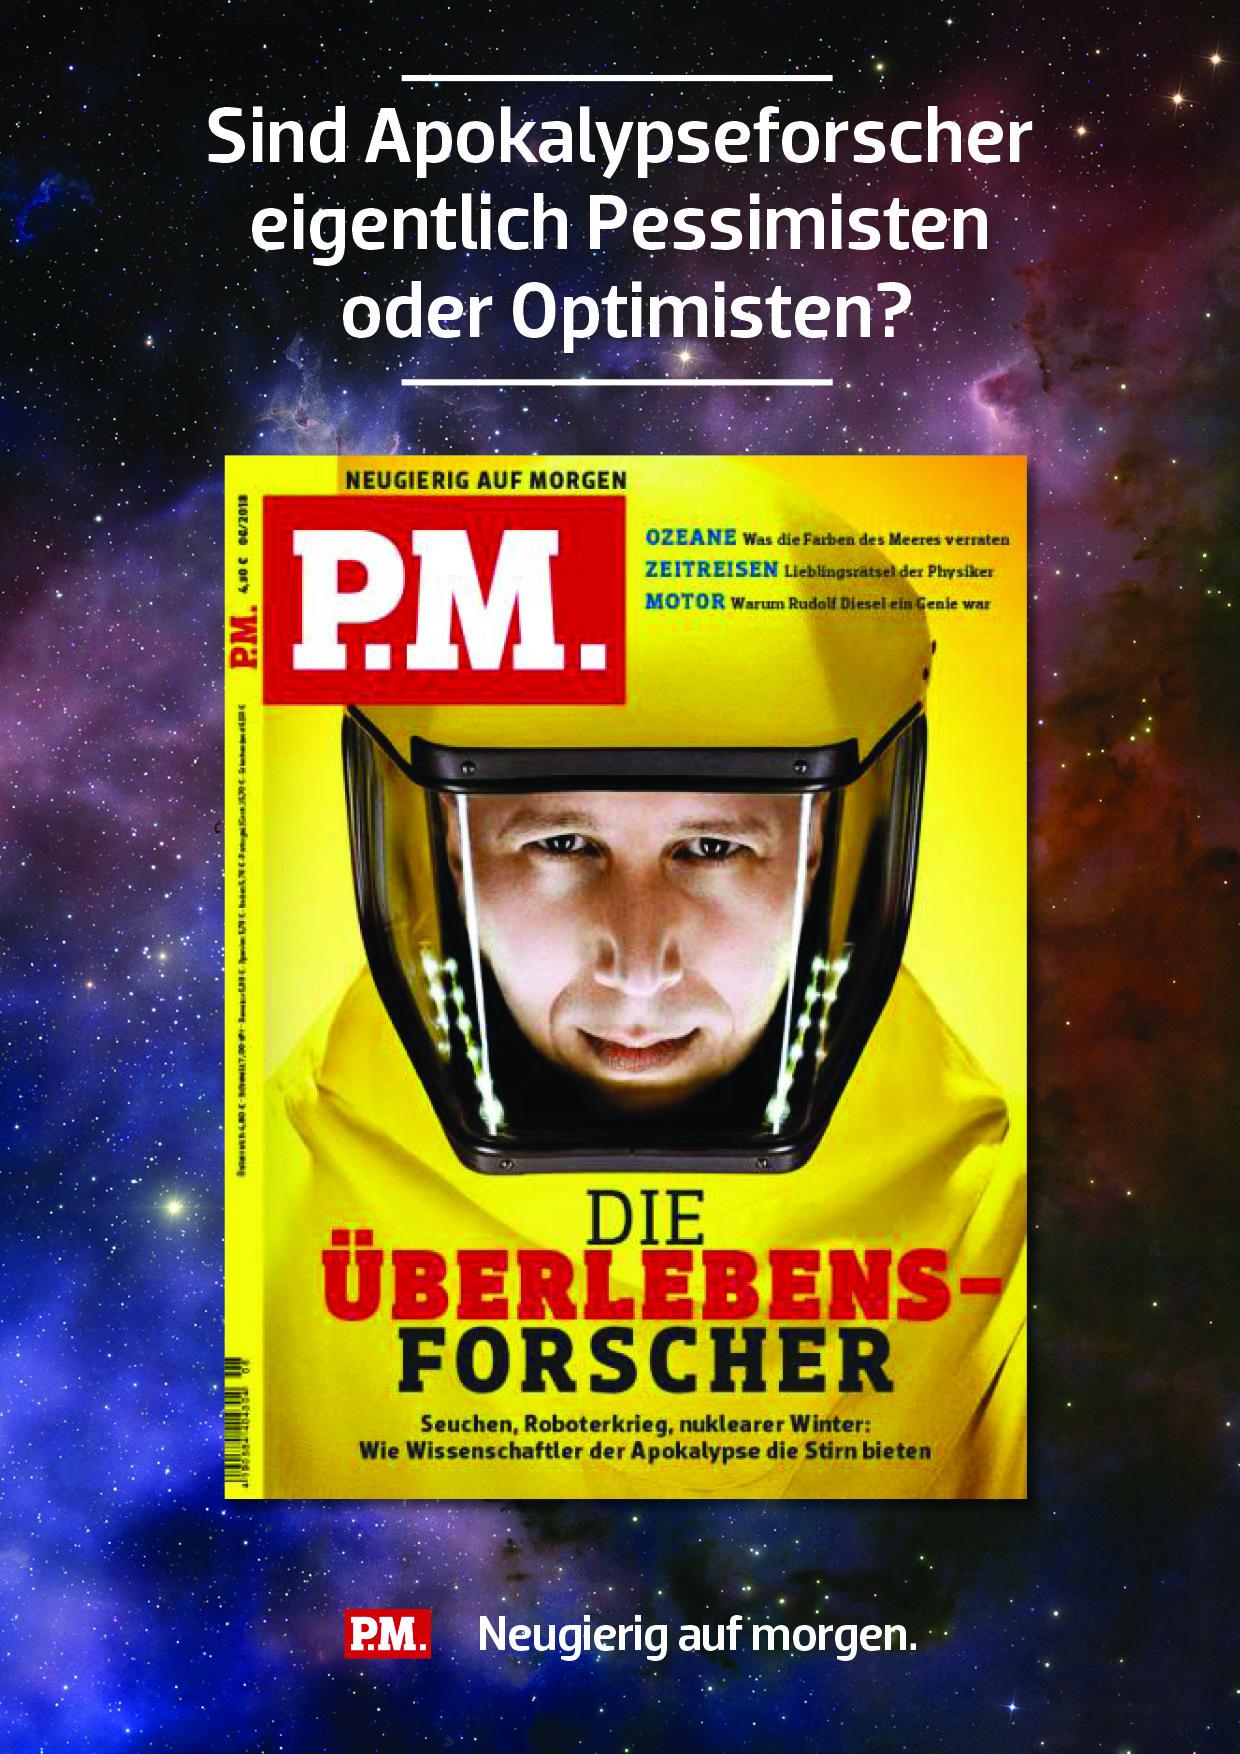 PM_apocalypse_180606_ar5.jpg